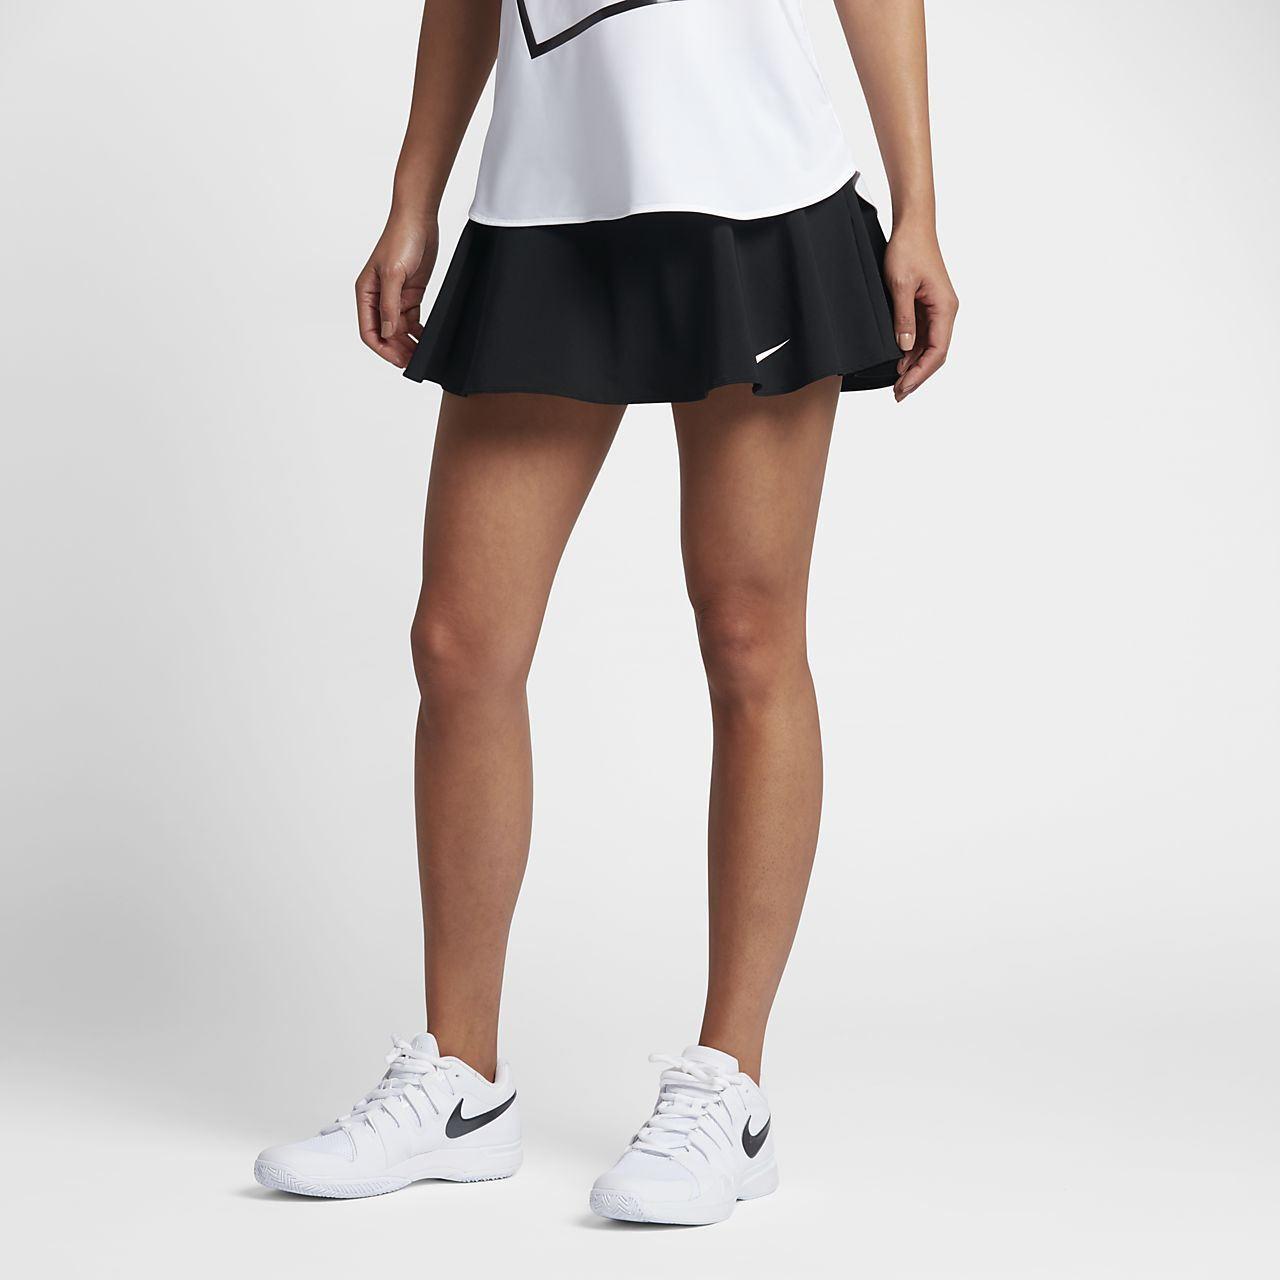 nike tennis skirt xl